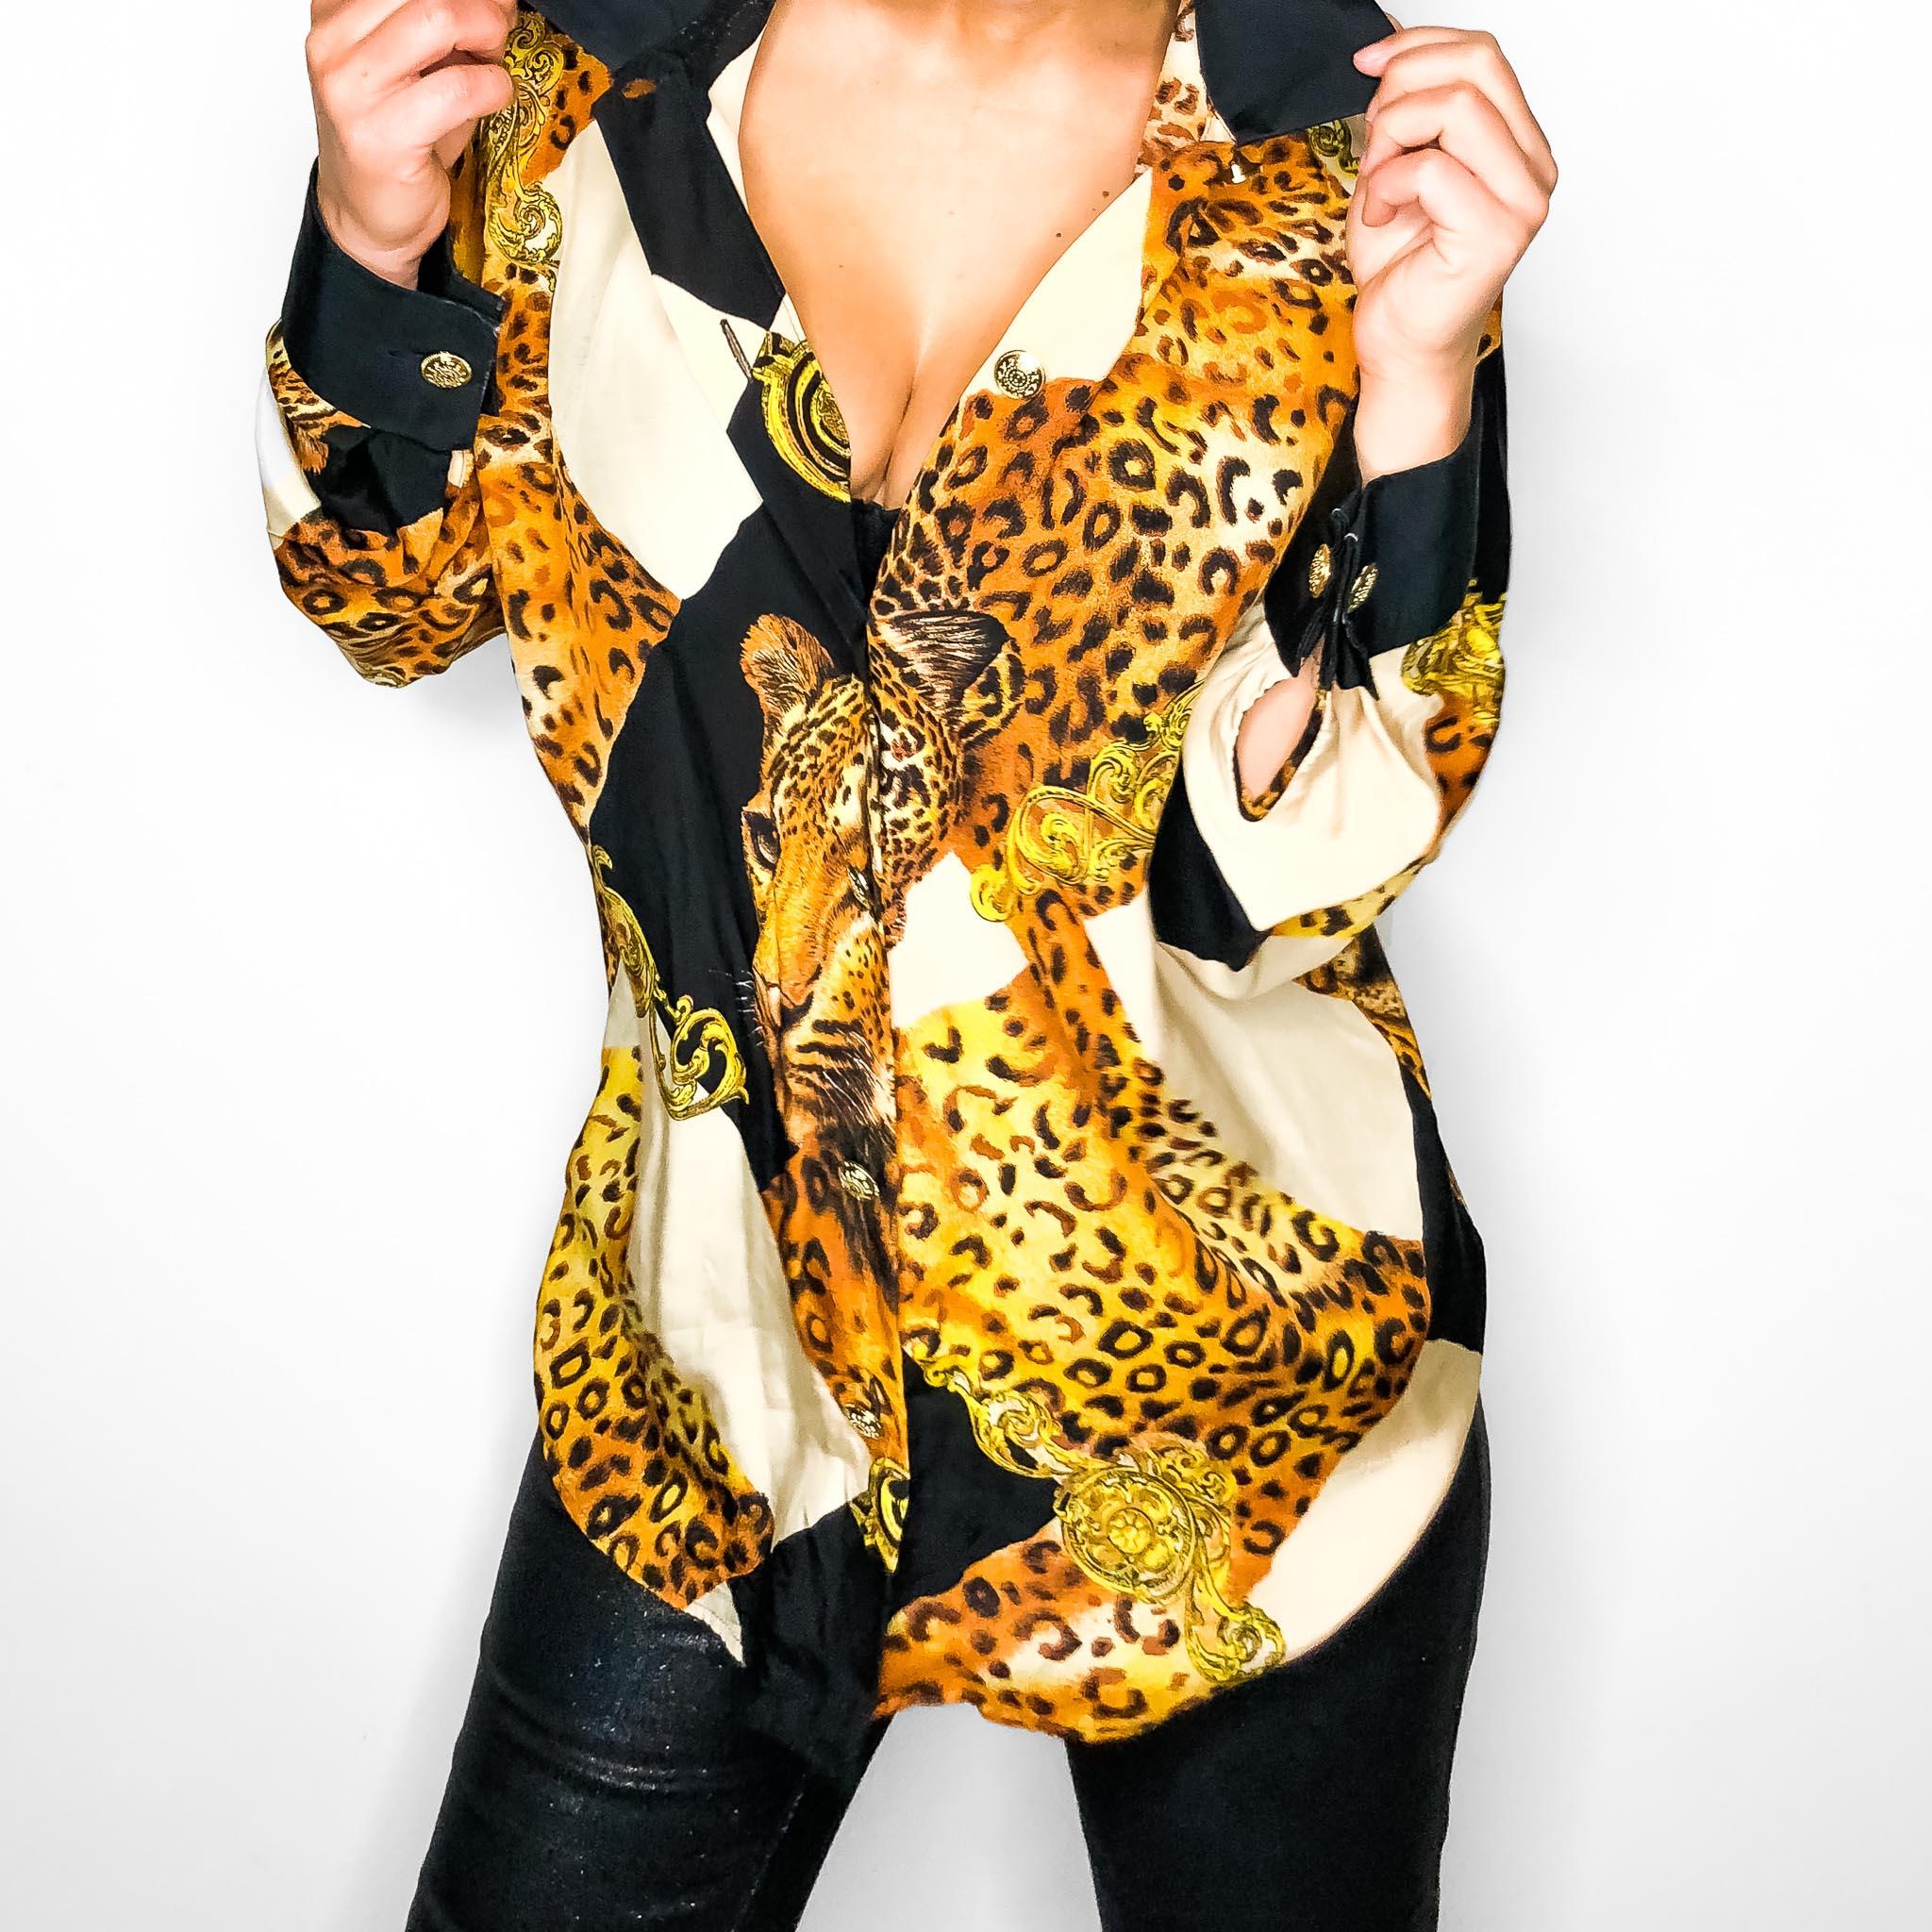 koszula w tygrysy, a'la versace, vintage